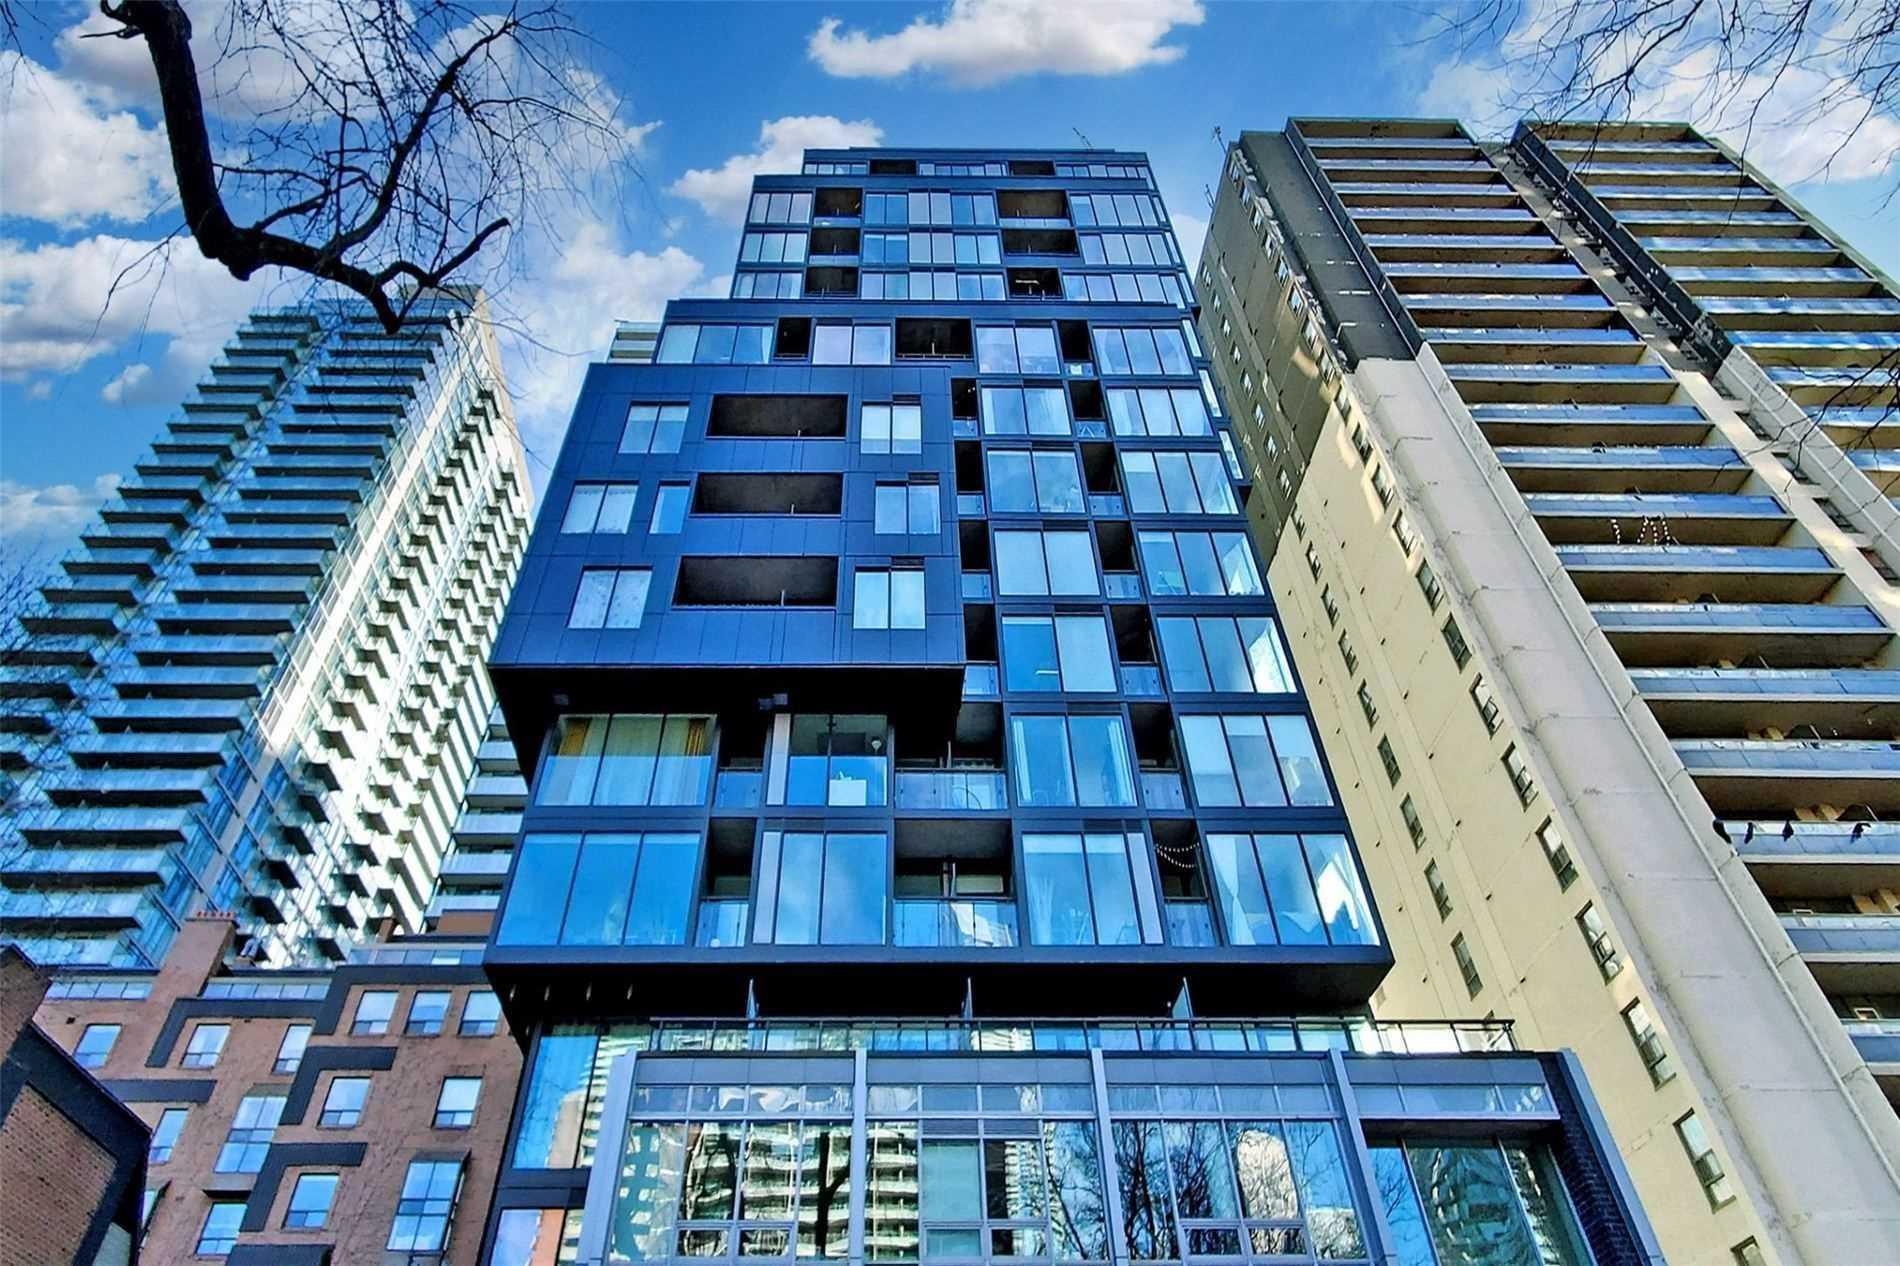 Condo Apt For Sale In Toronto , 1 Bedroom Bedrooms, ,1 BathroomBathrooms,Condo Apt,For Sale,607,Dundonald